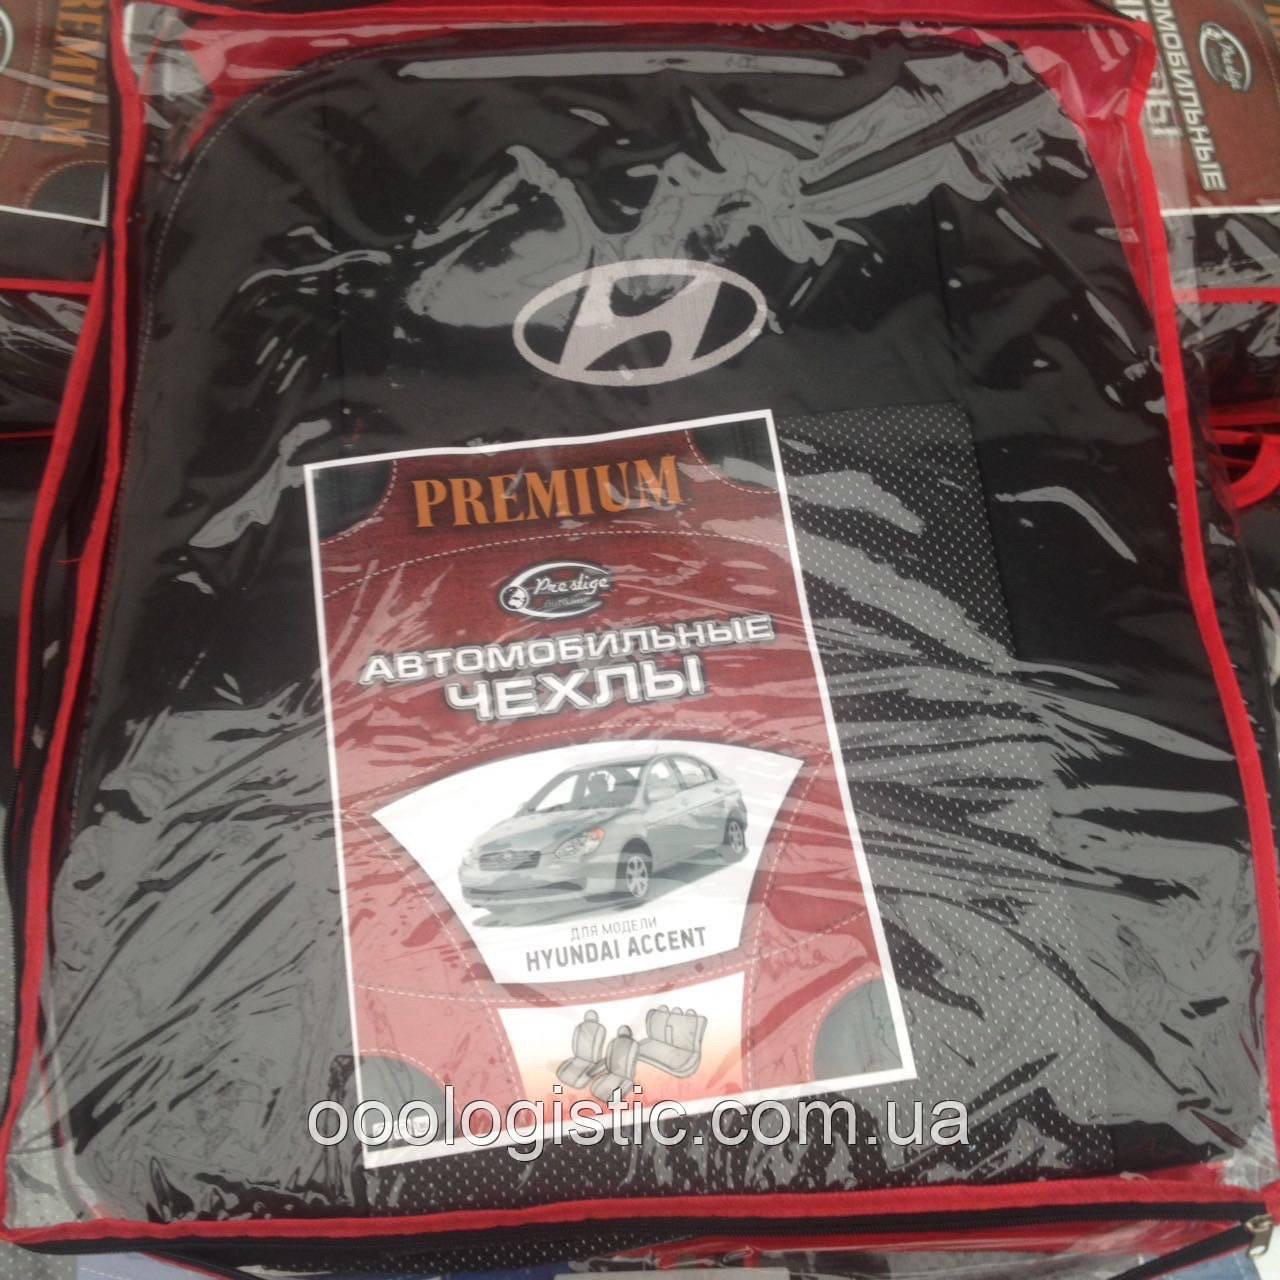 Авточехлы Prestige на Hyundai Accent ,авточехлы Престиж на Хюндай Акцент